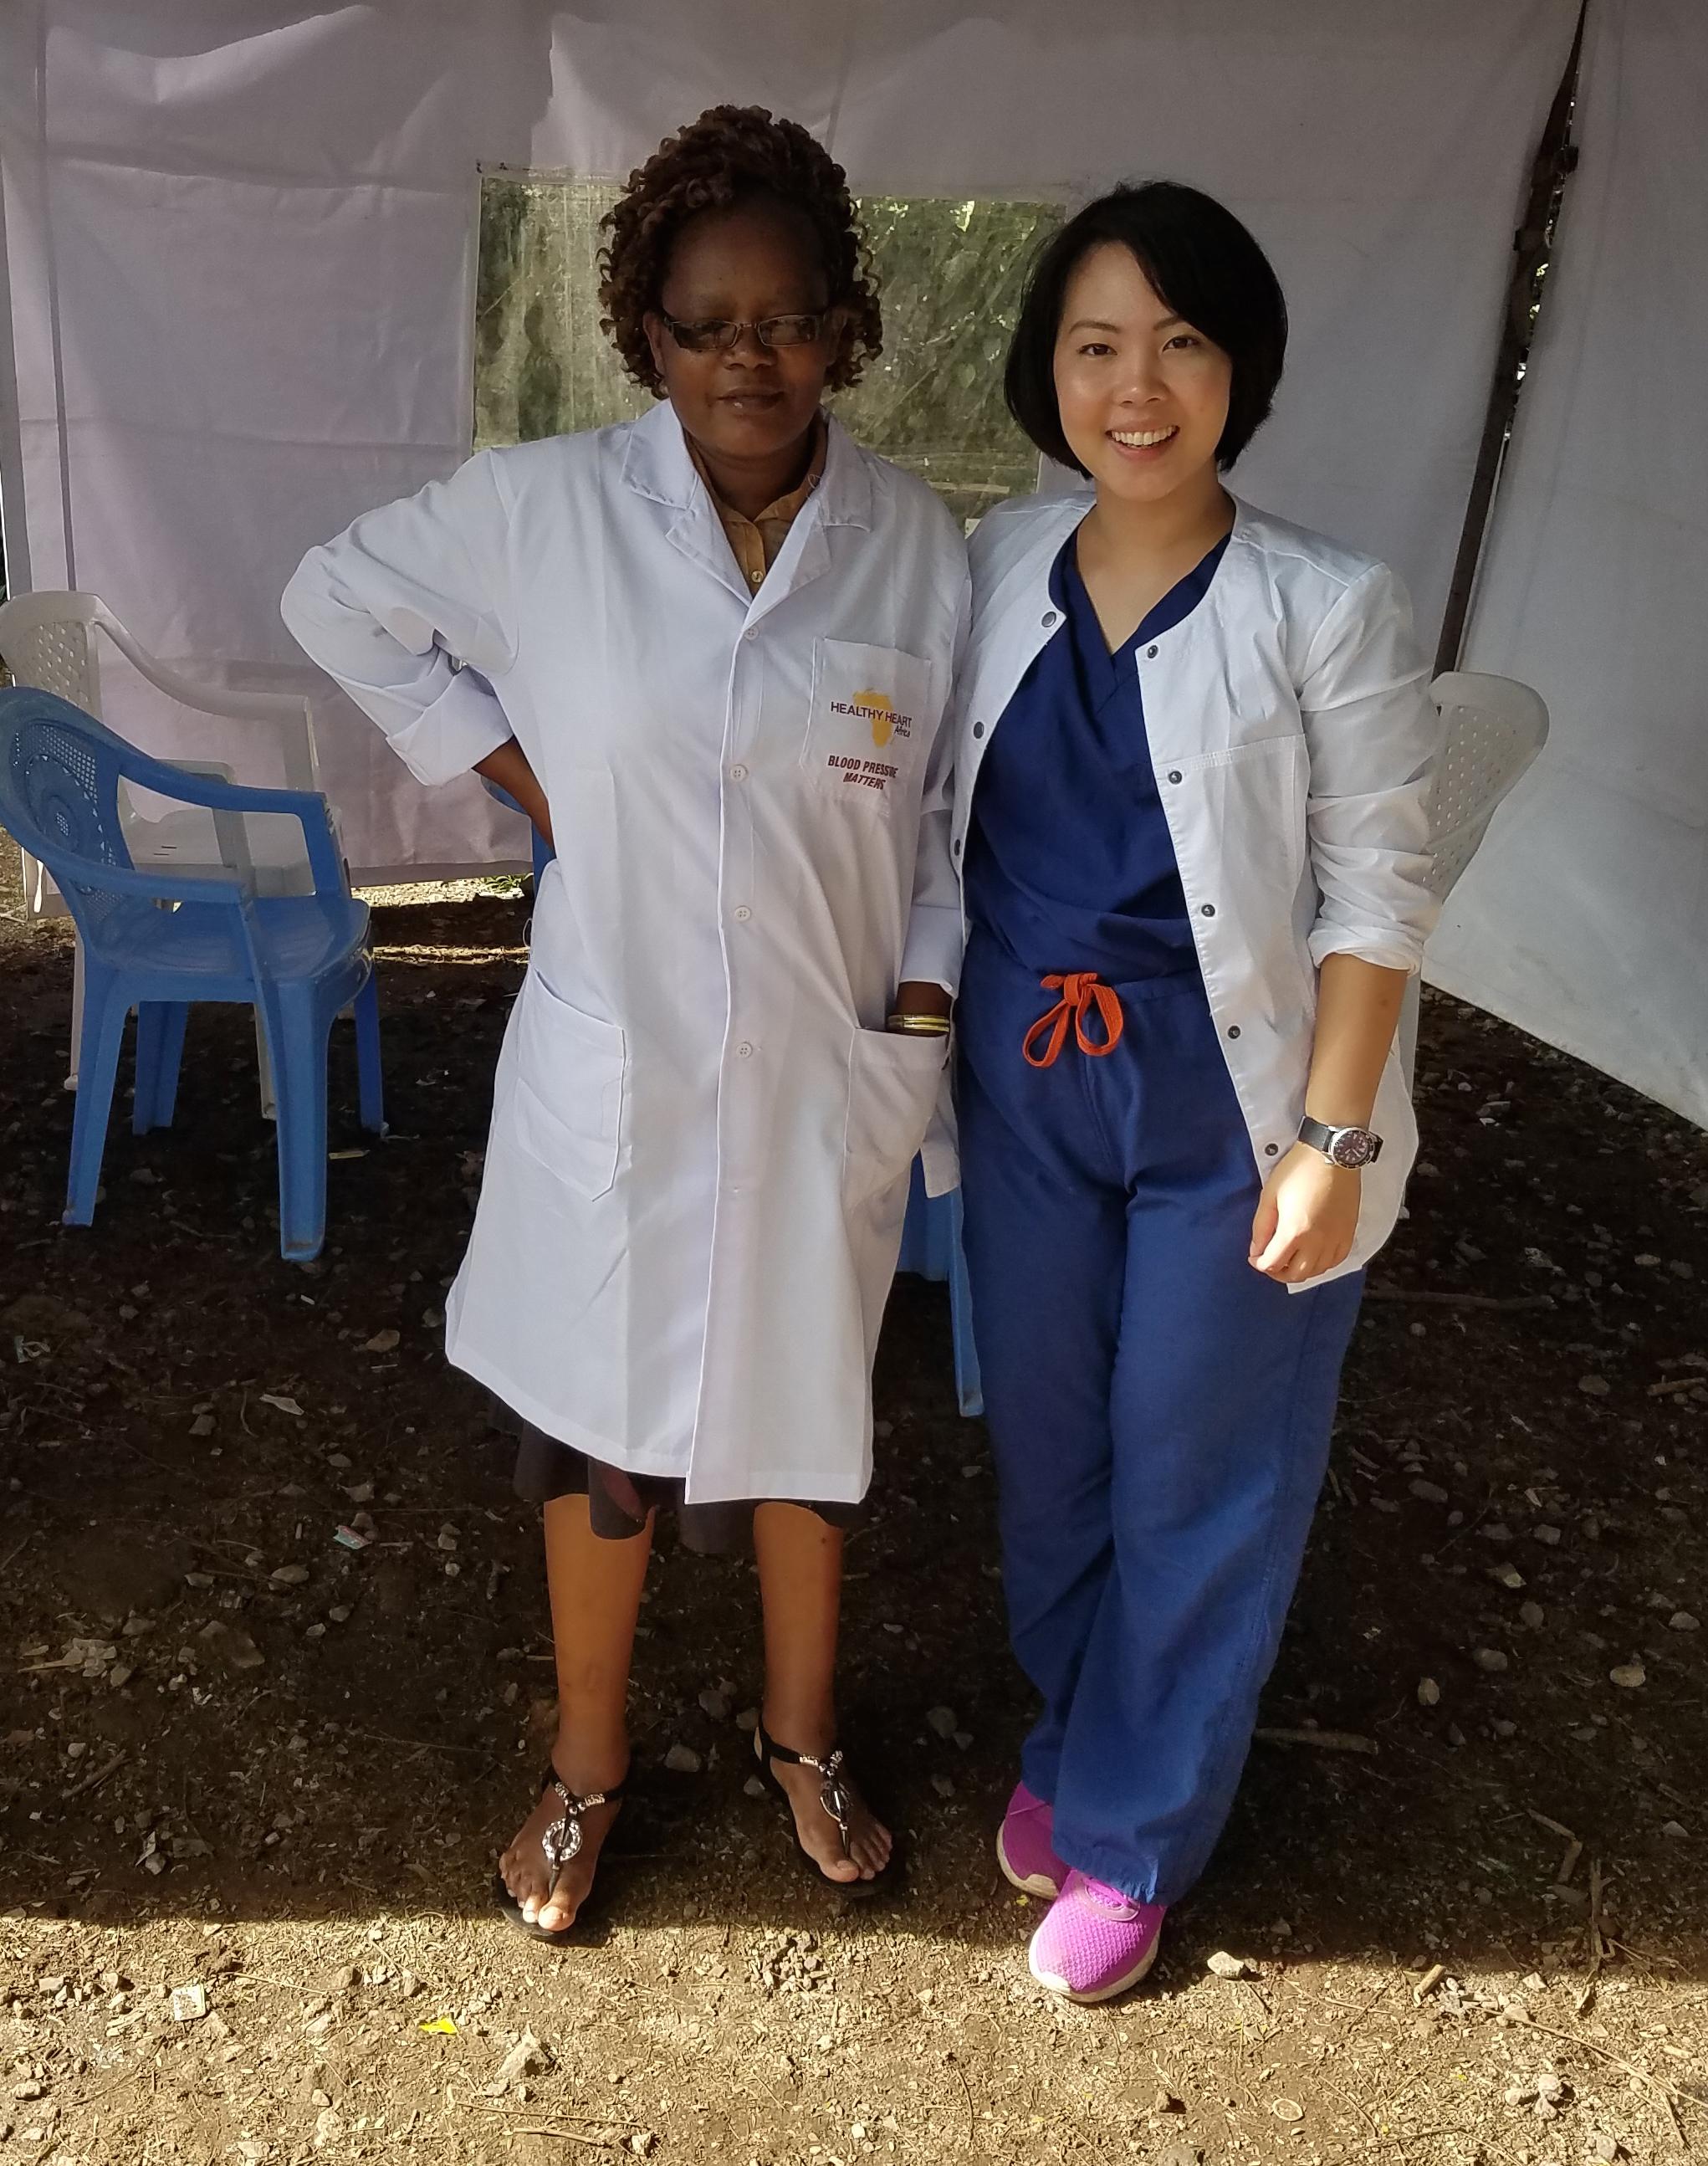 Mencias Medical mission